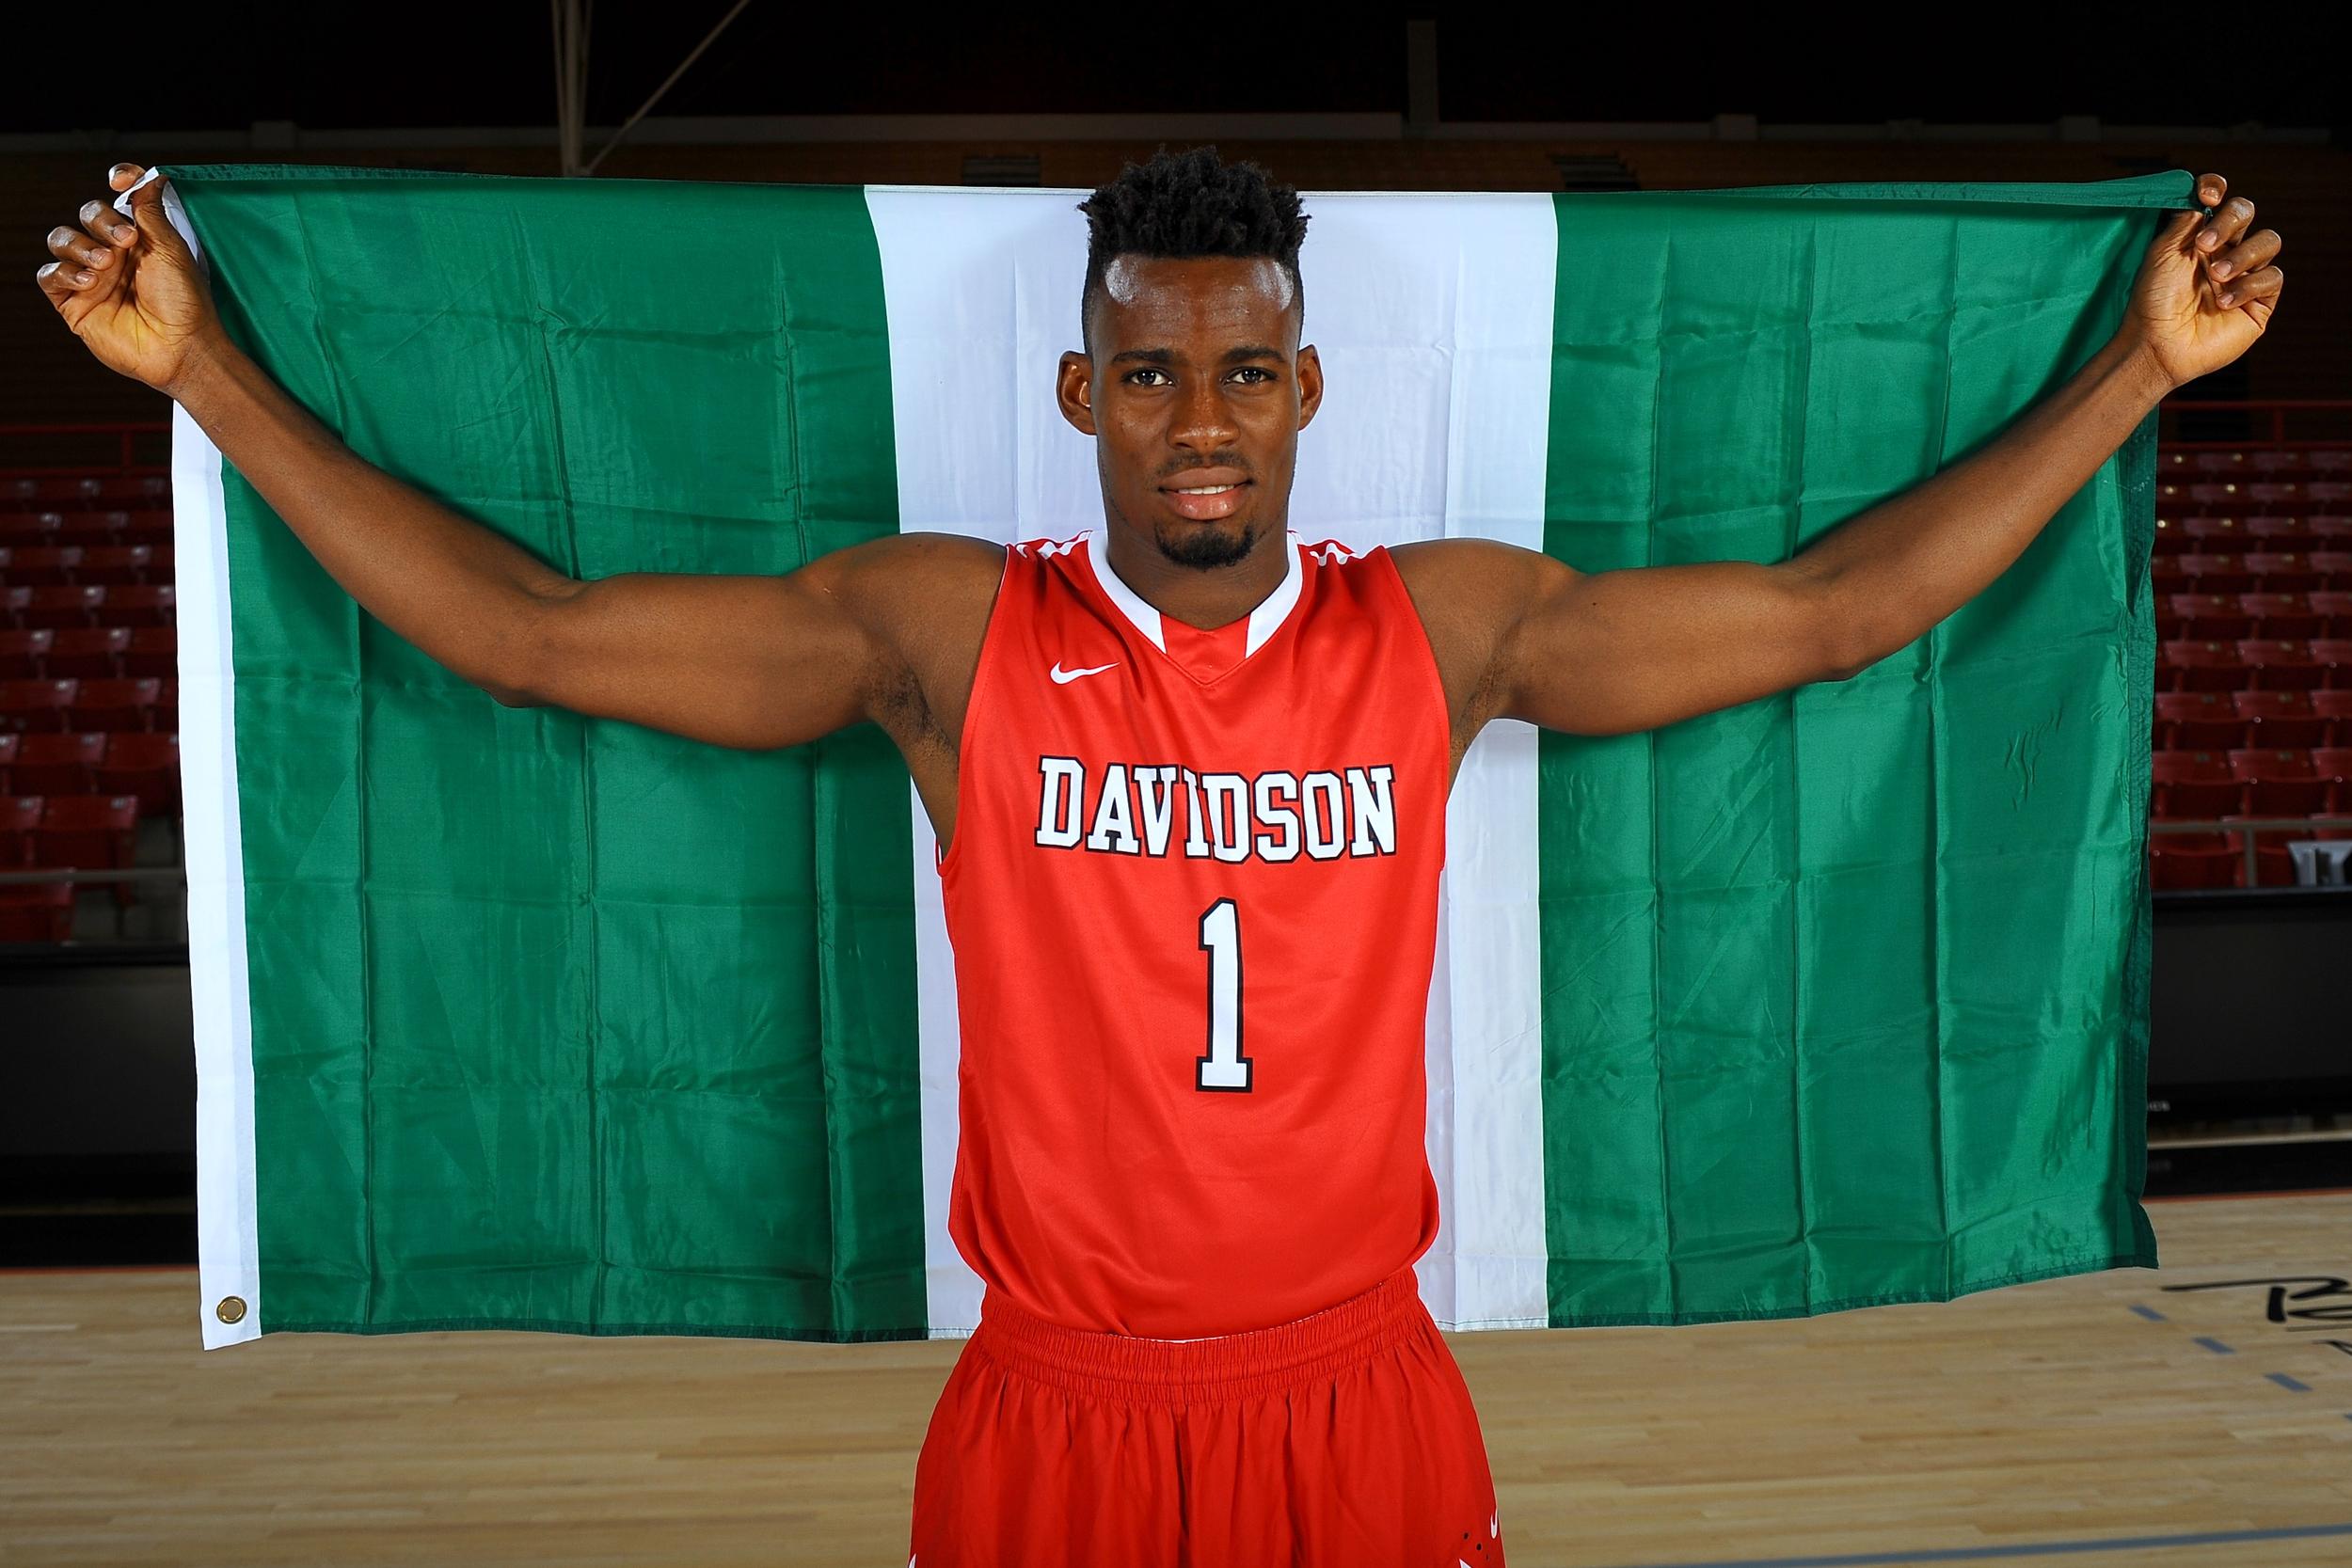 19 October 2014:  Davidson men's basketball pose for their annual team photos at Belk Arena in Davidson, North Carolina. Credit - Tim Cowie - DavidsonPhotos.com